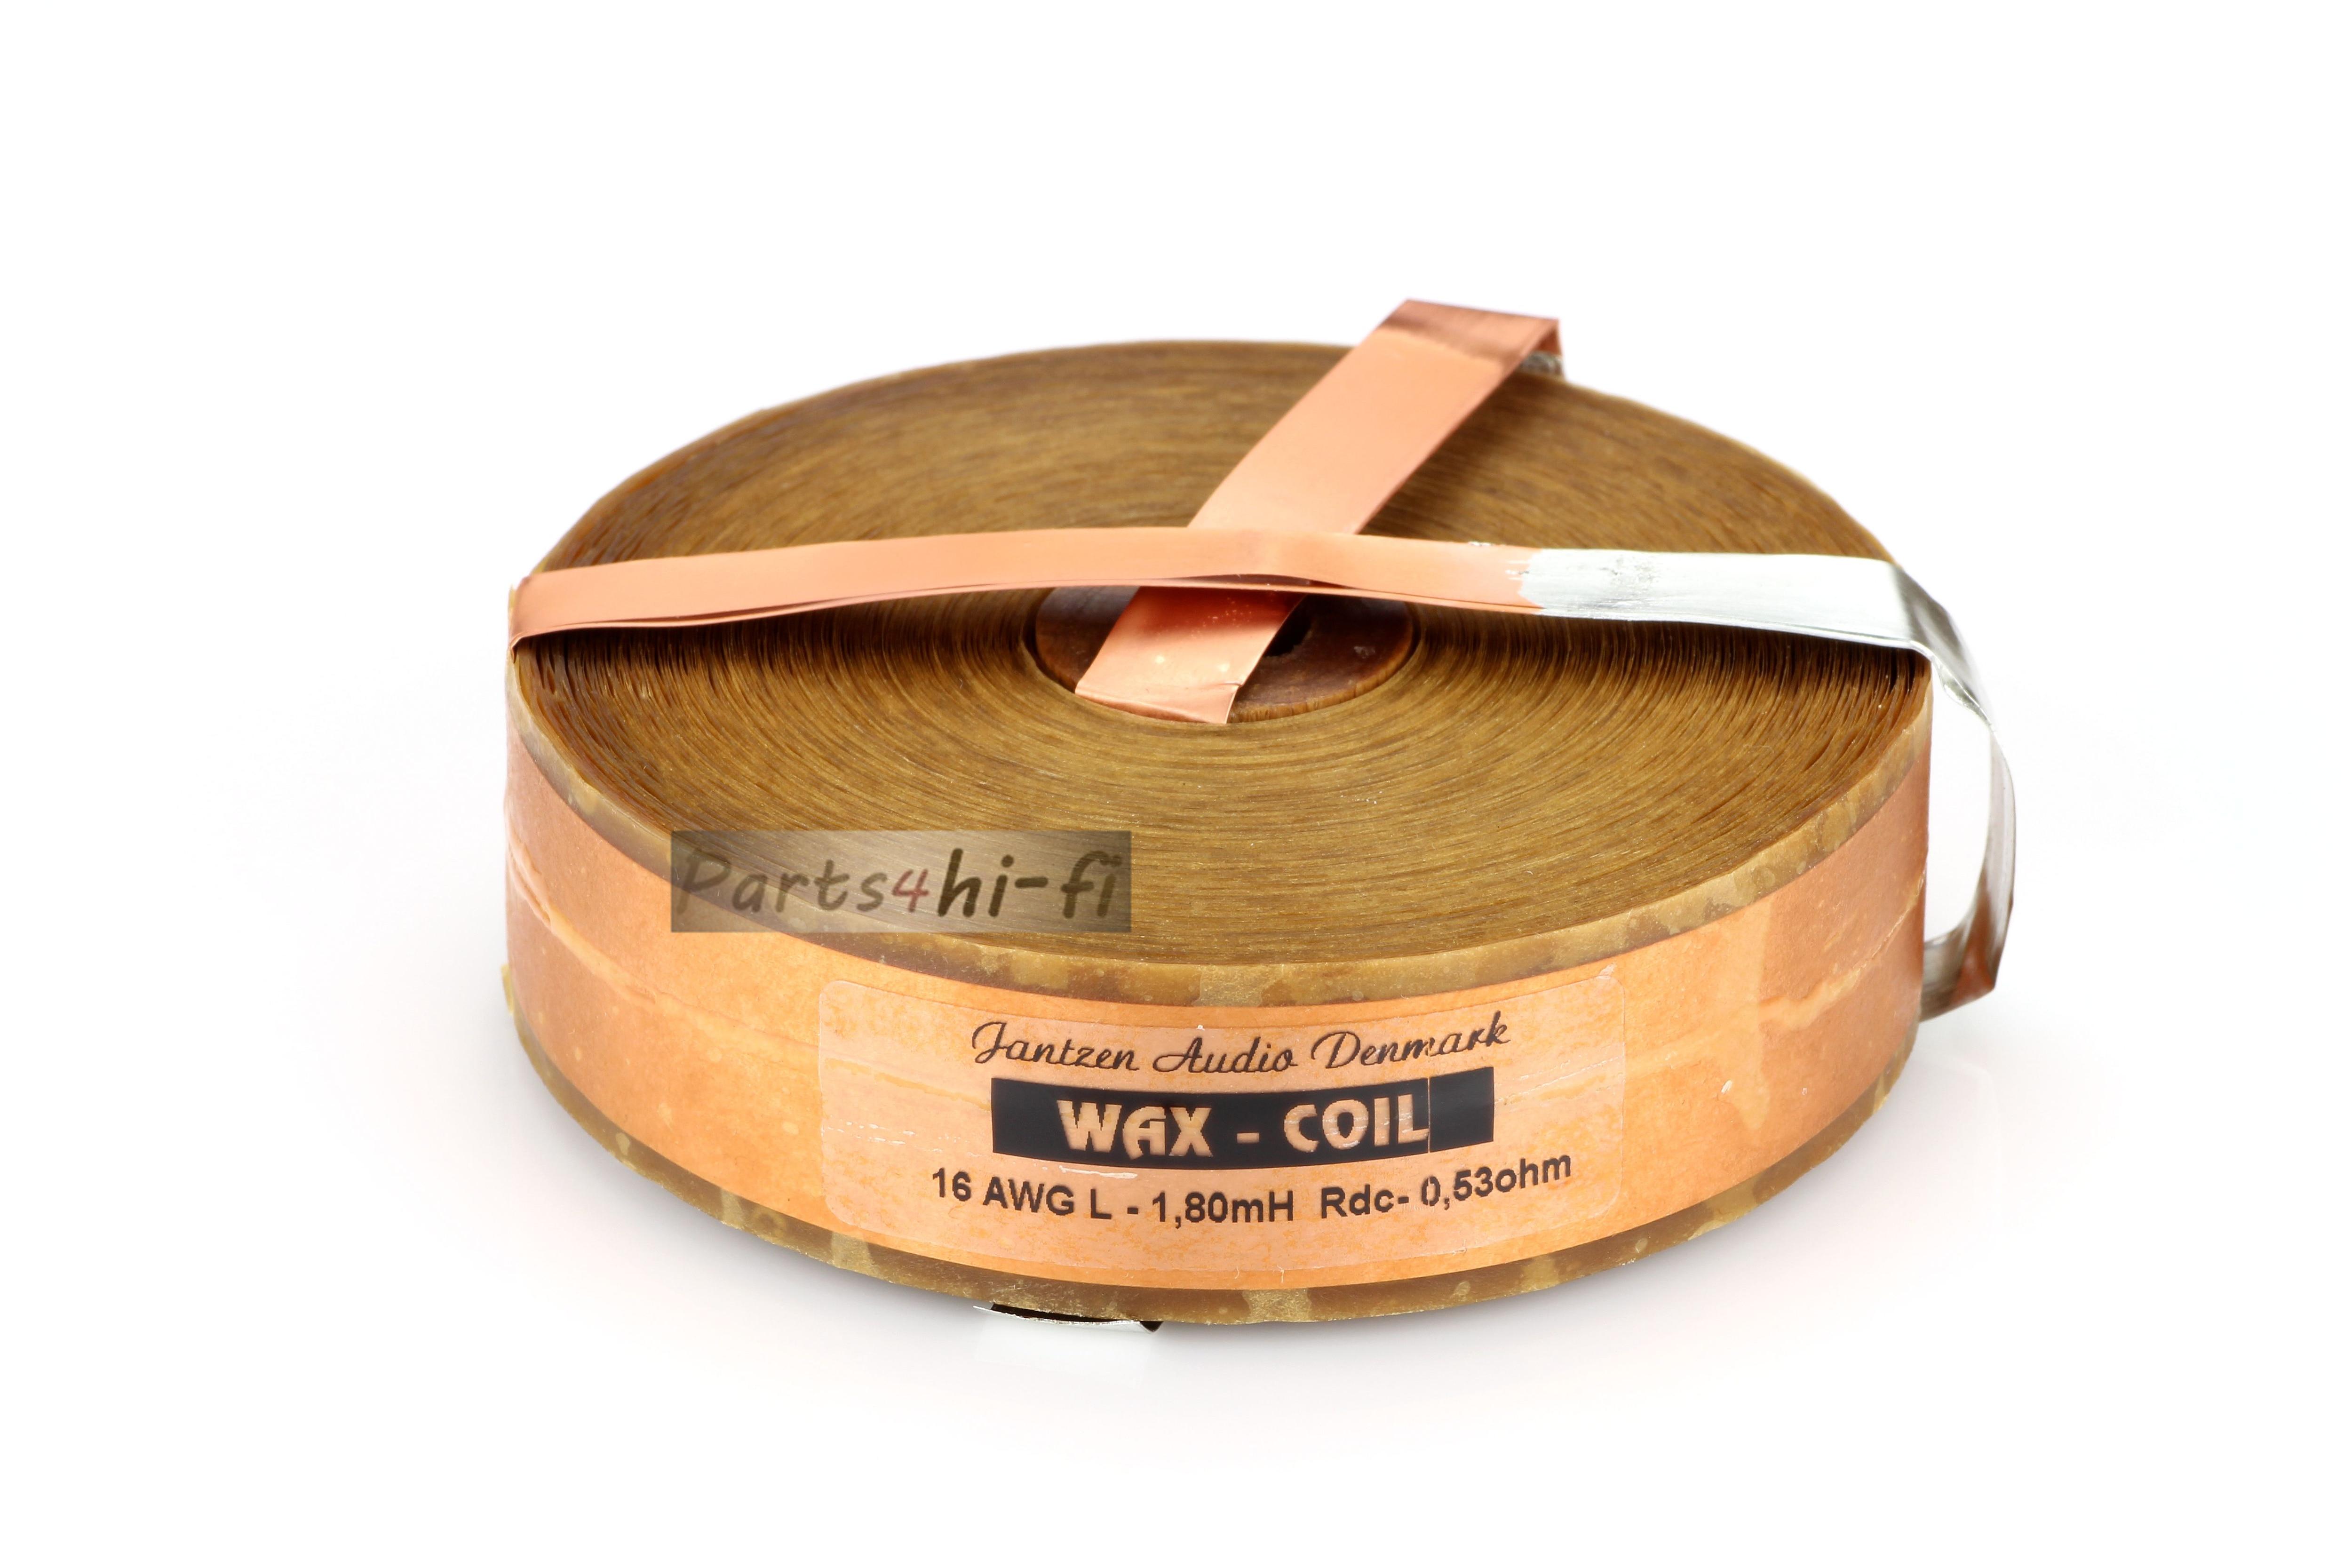 2pcs/lot Denmark Jantzen-audio WAX COIL Wax Copper Foil Inductor 16awg (1.3mm) Free Shipping